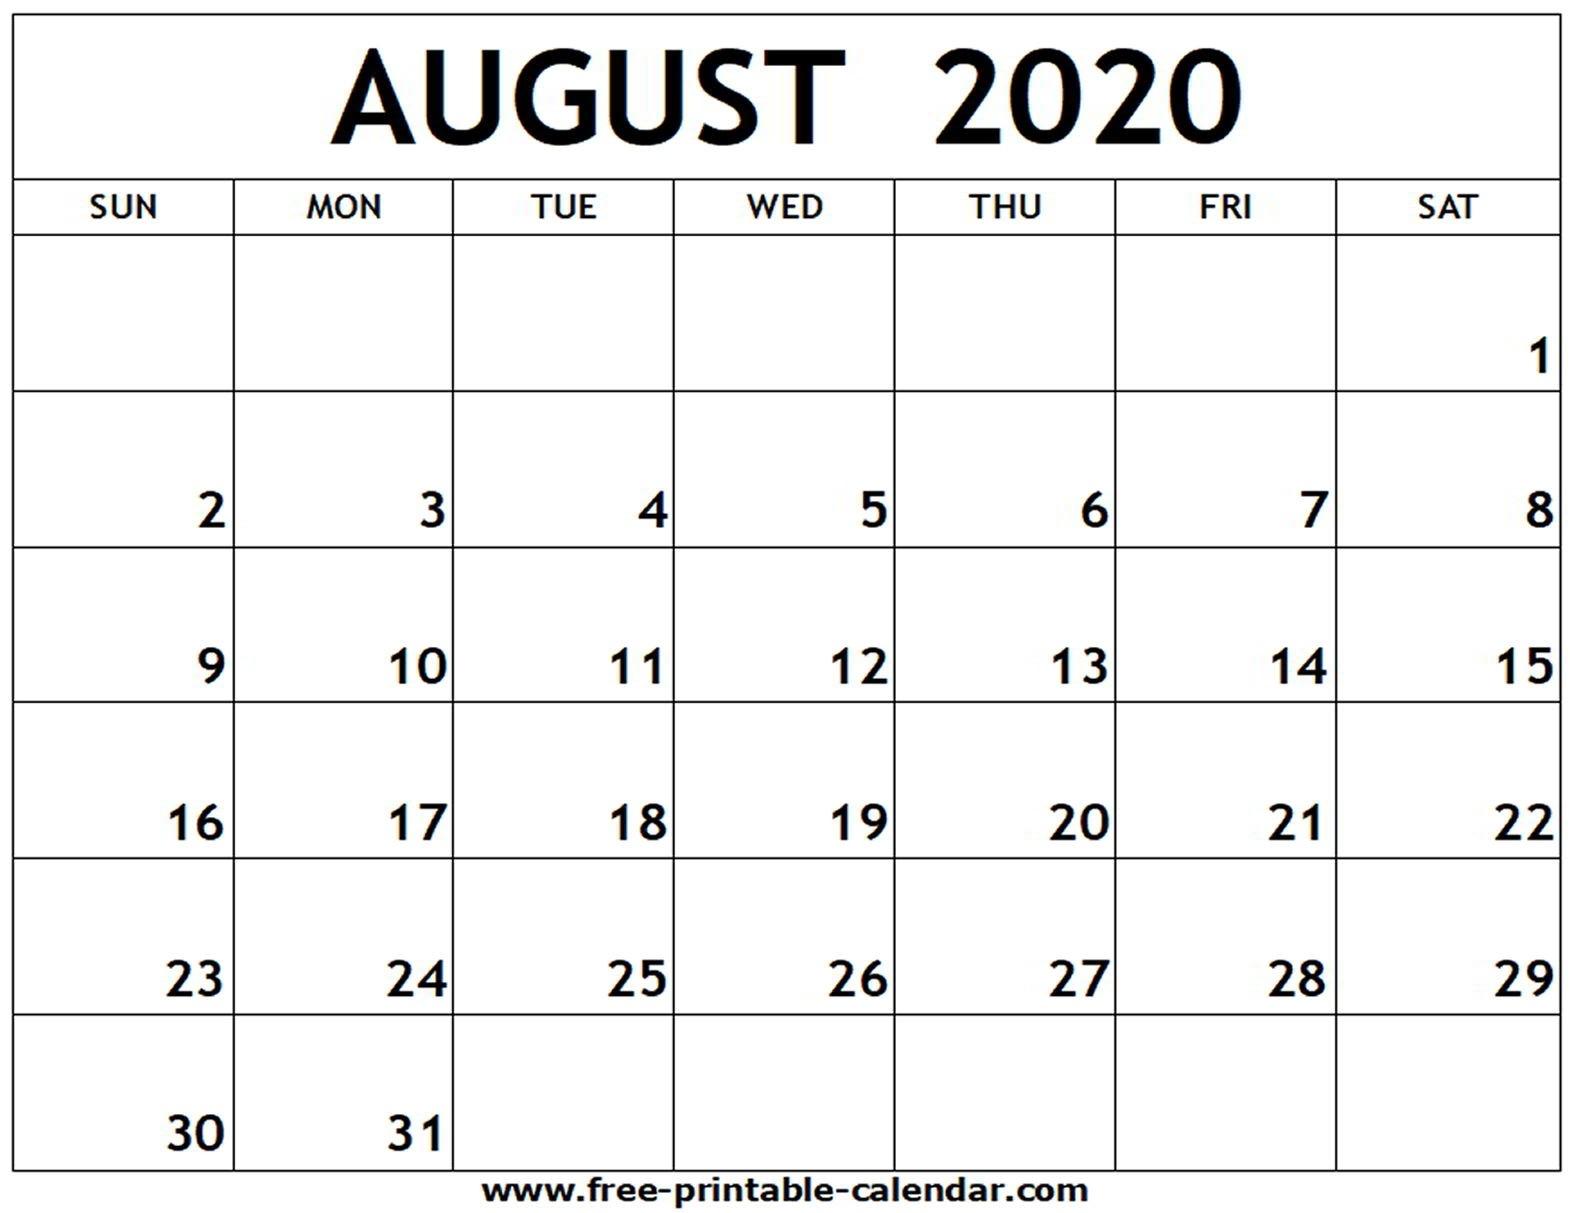 August 2020 Printable Calendar - Free-Printable-Calendar-Free Printable Monthly Calendar August 2020